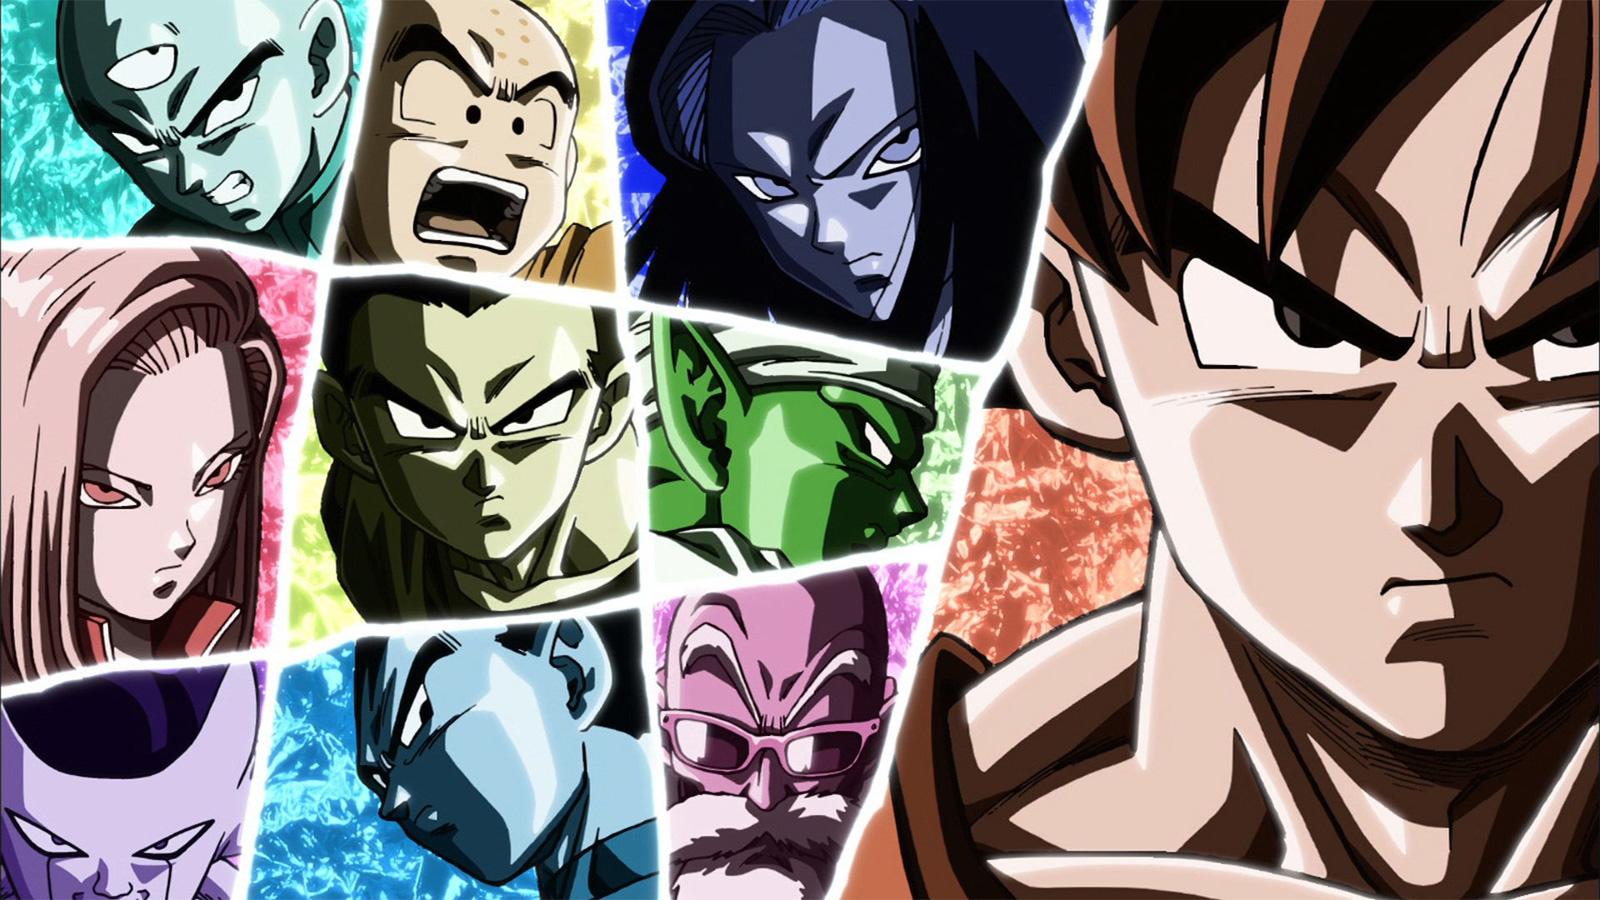 Adieu Dragonball Super (Dragon Ball Super) - Im März wird die TV-Seri